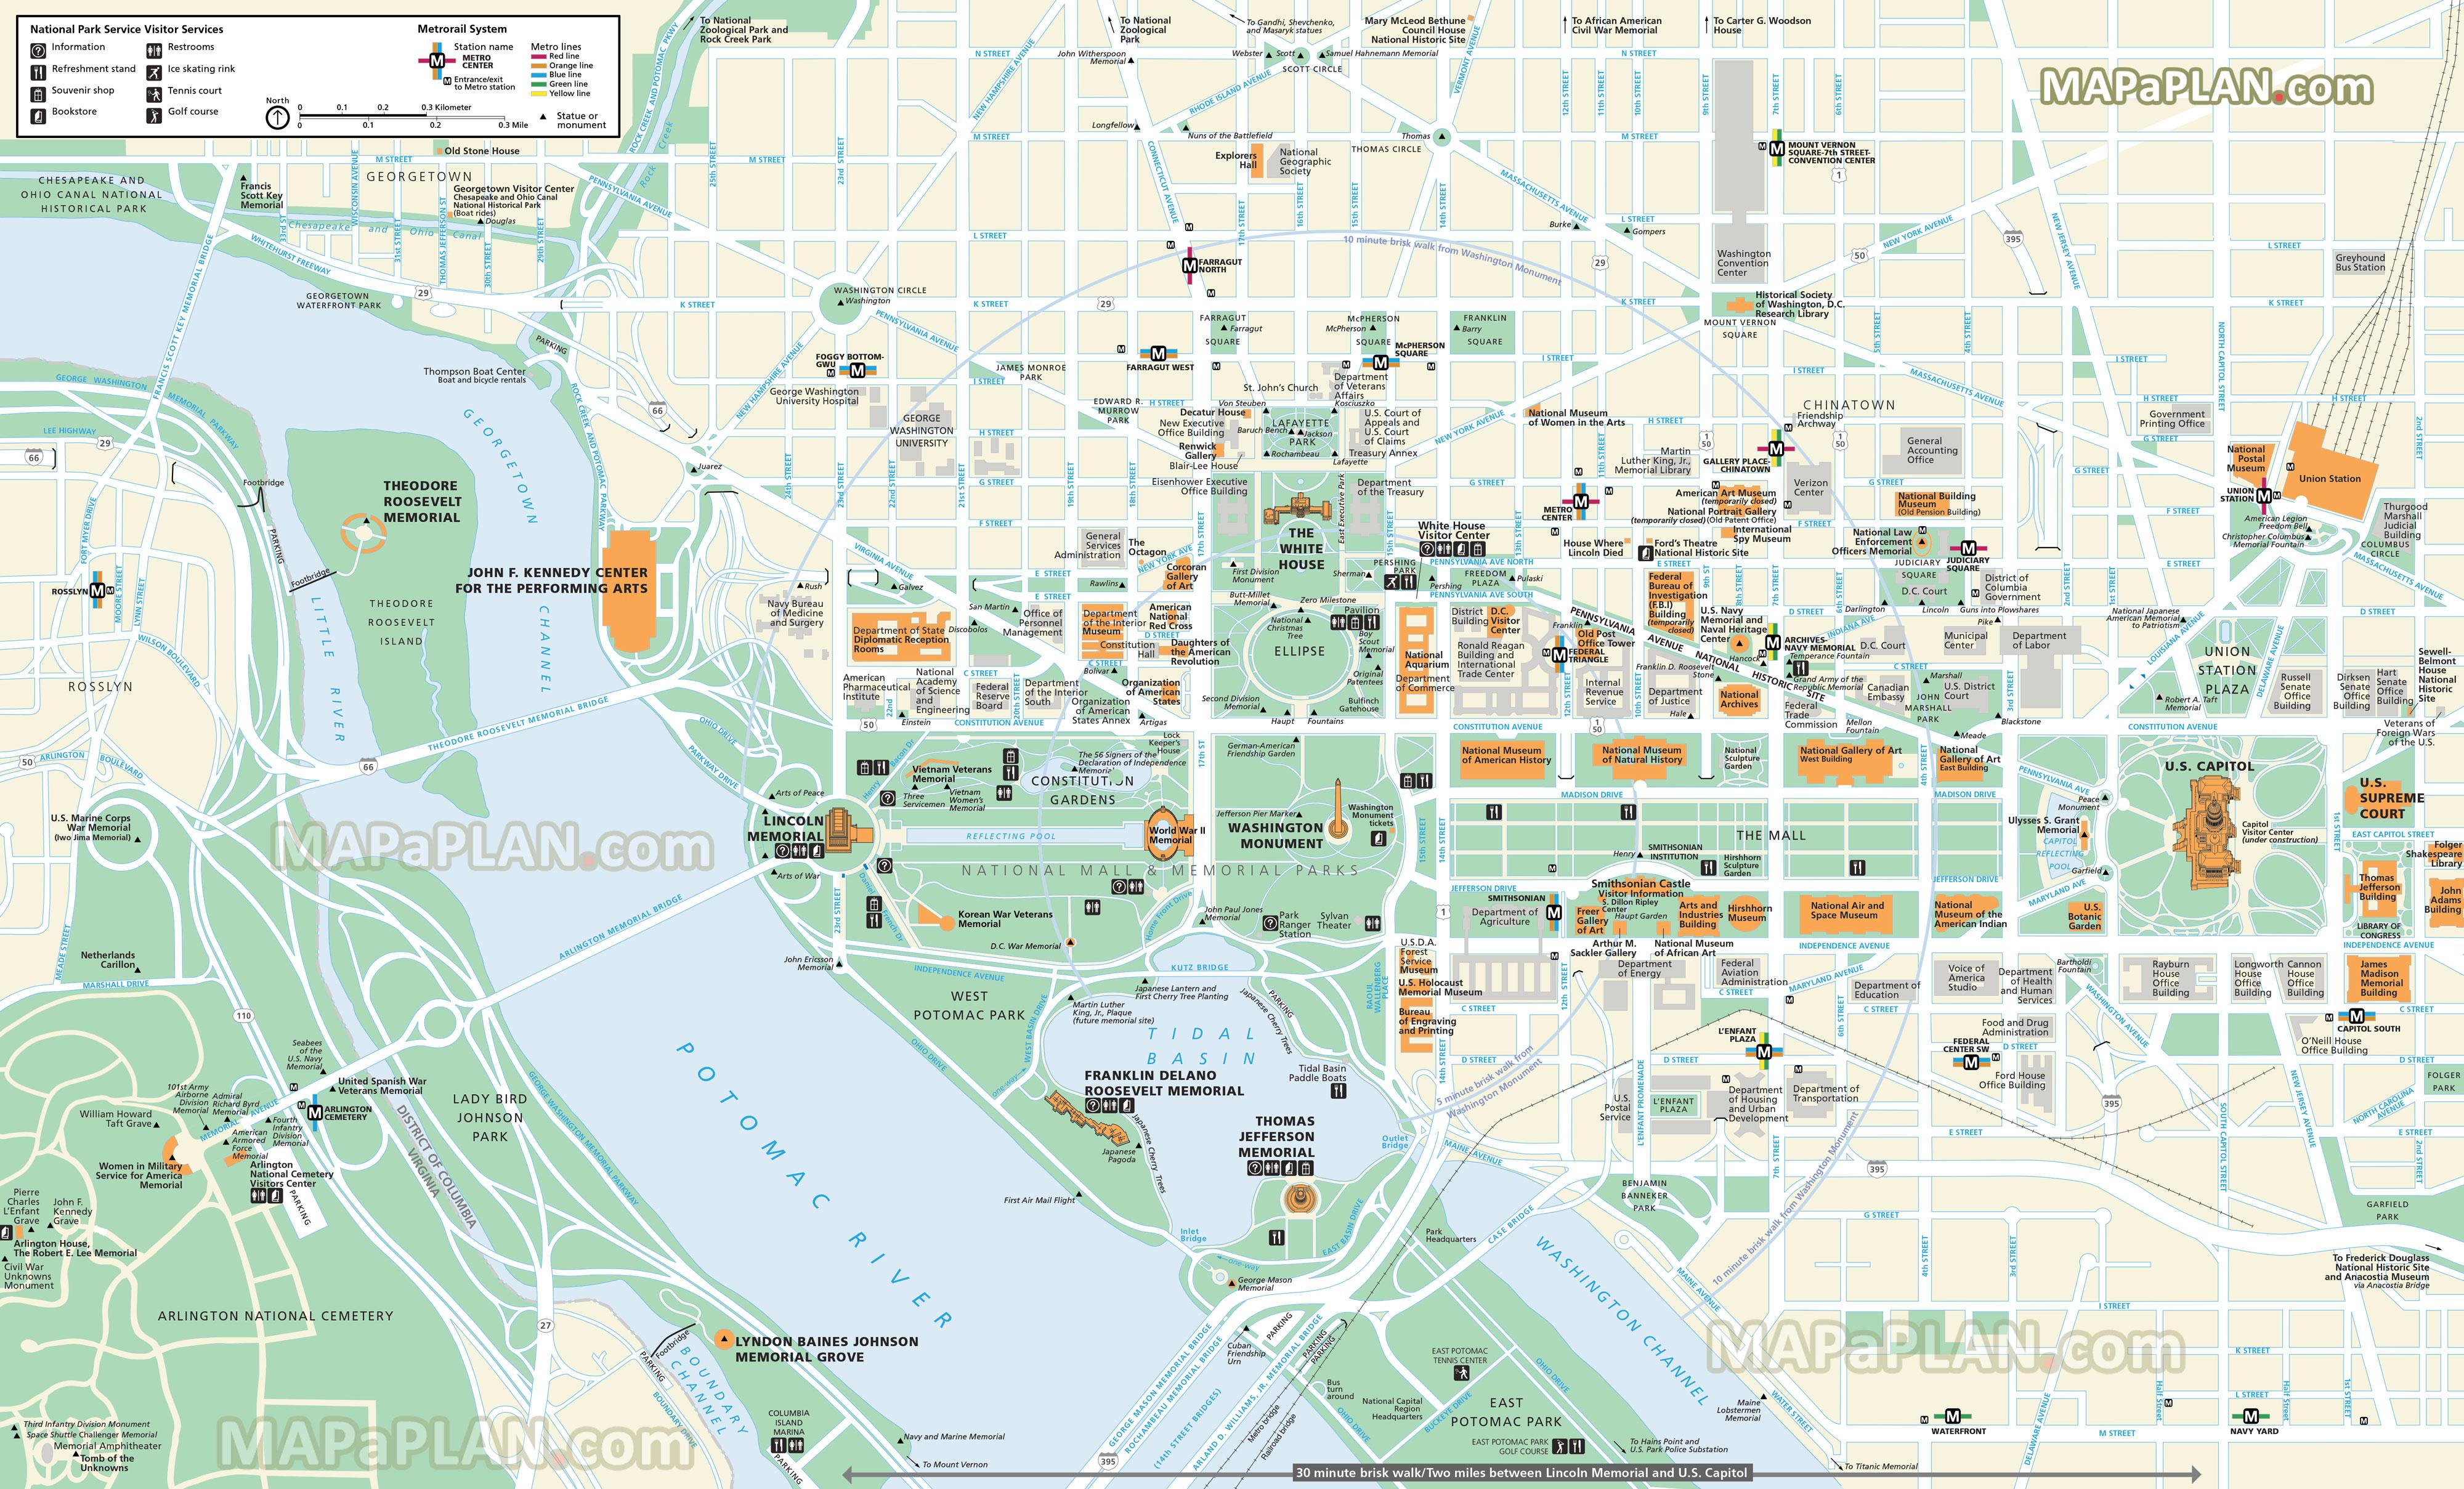 Washington Dc Maps - Top Tourist Attractions - Free, Printable City - Washington Dc Tourist Map Printable